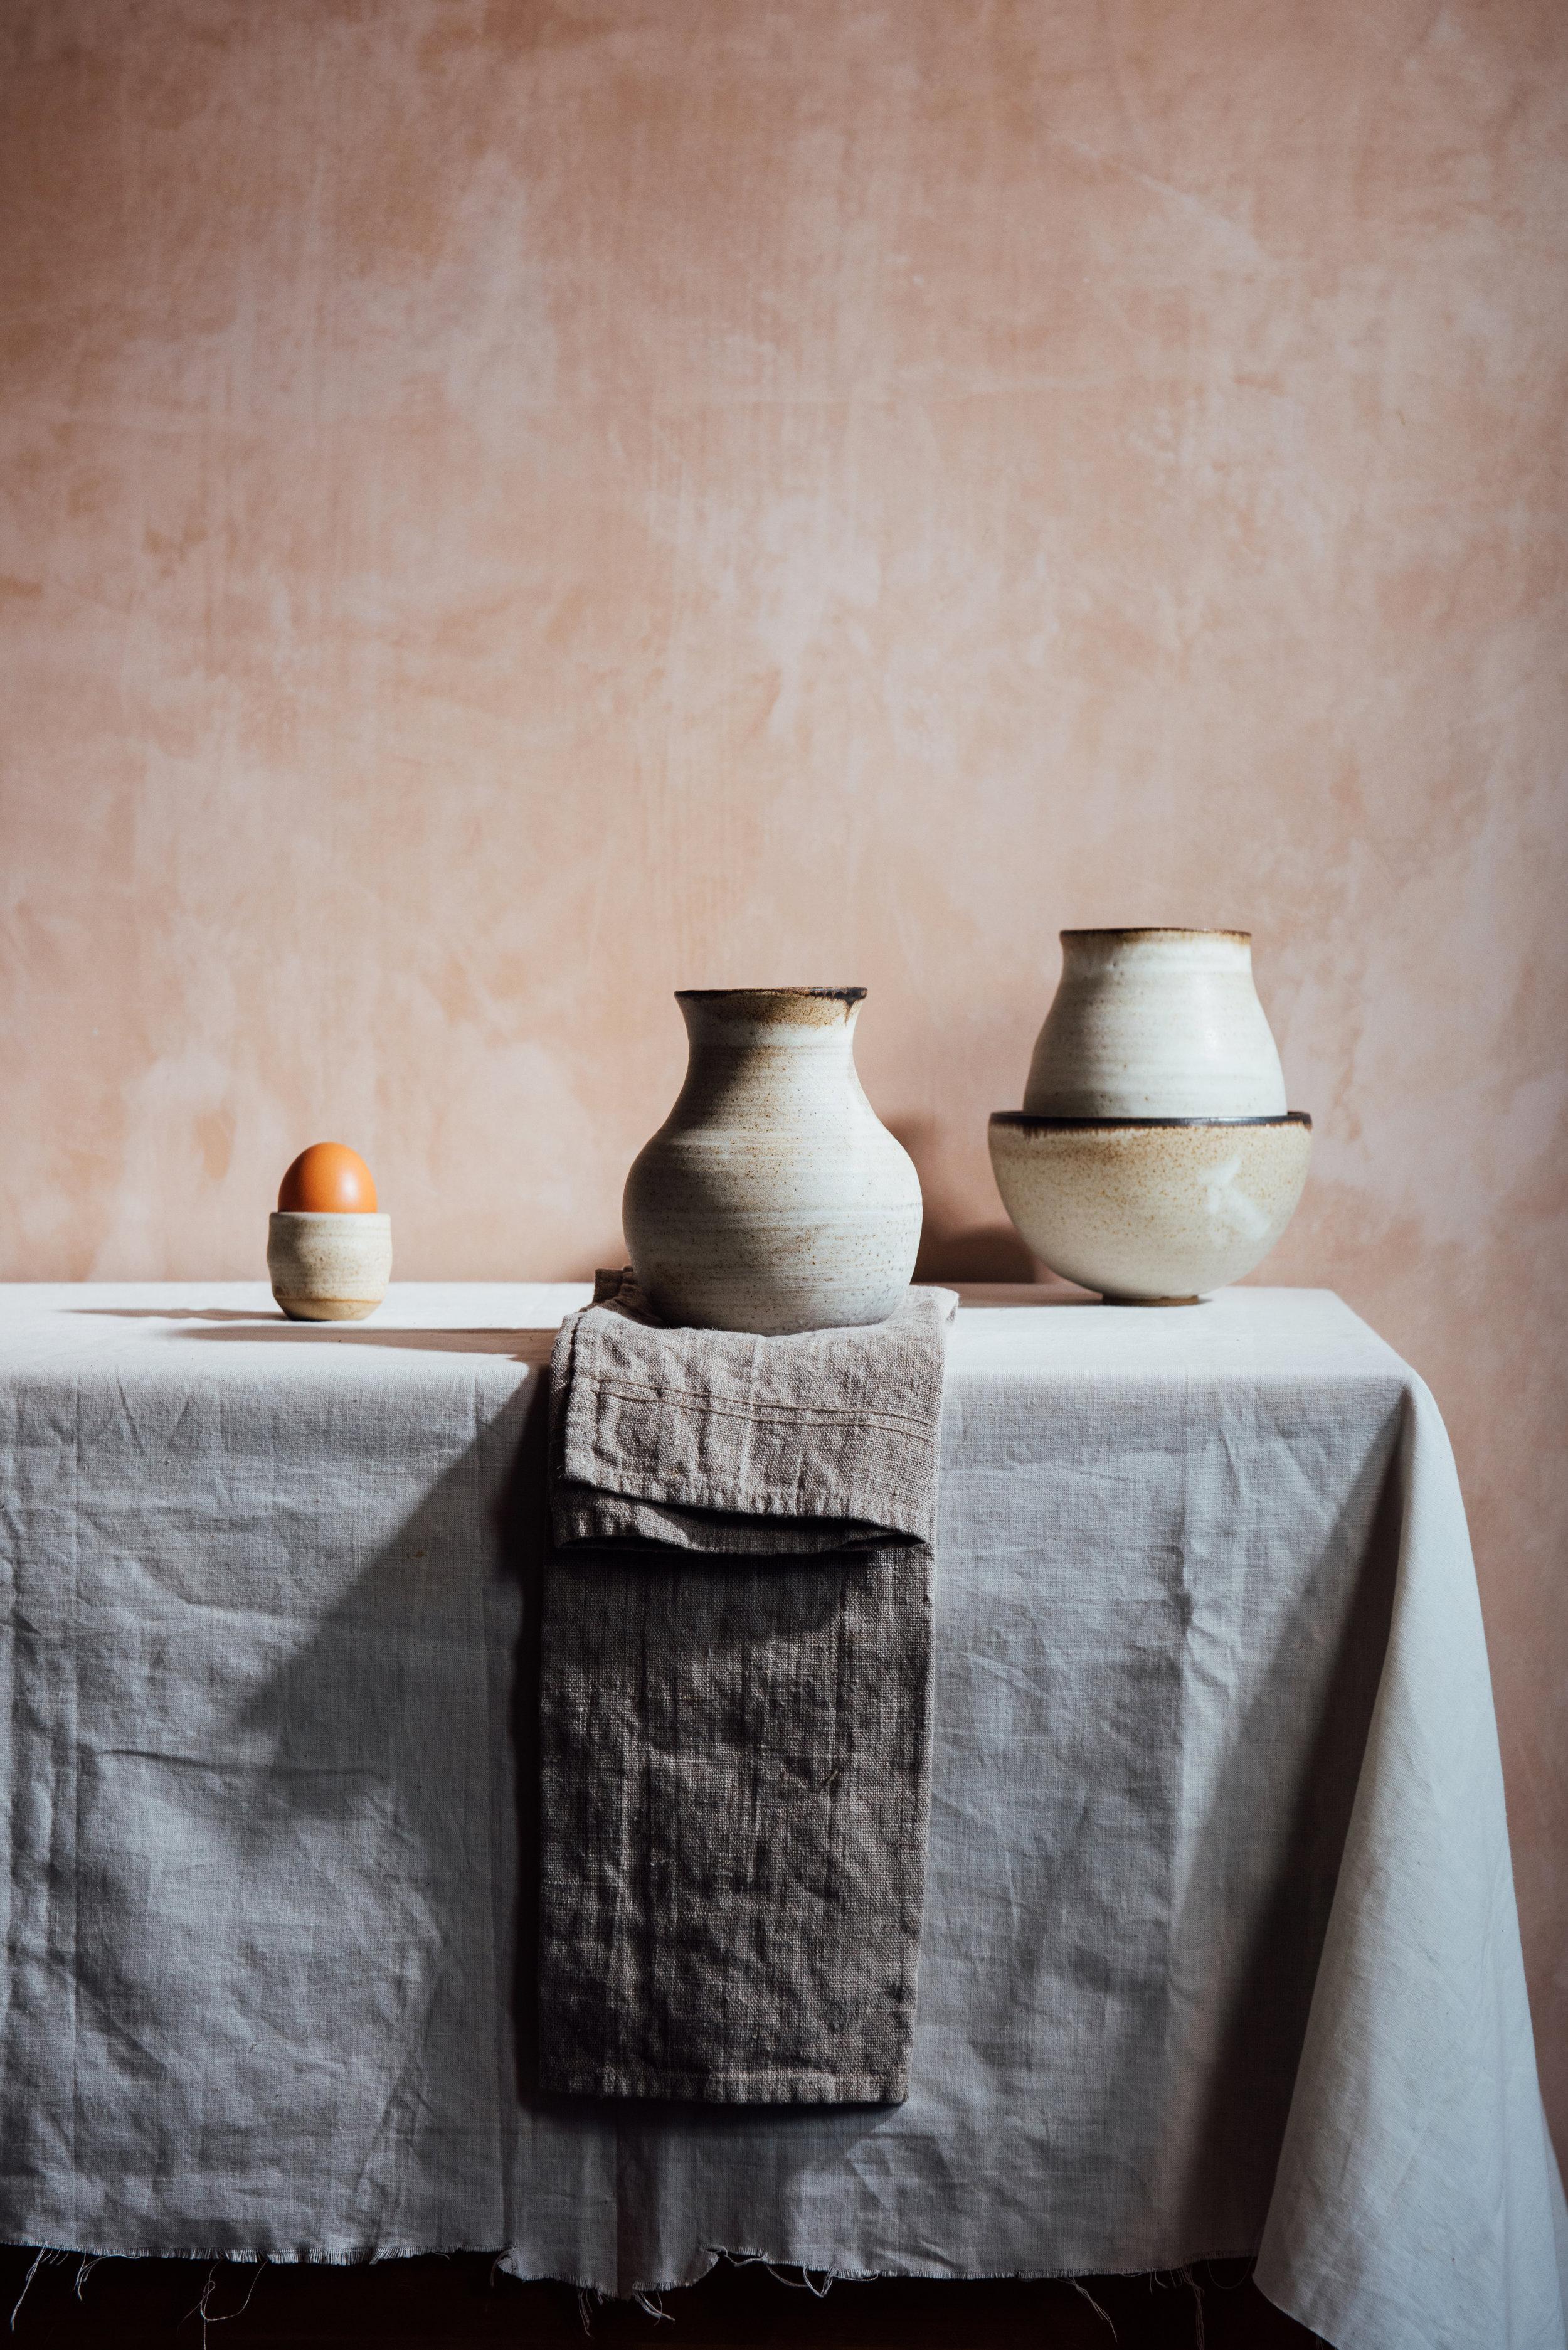 CM_Ceramics-JR2_3368.jpg